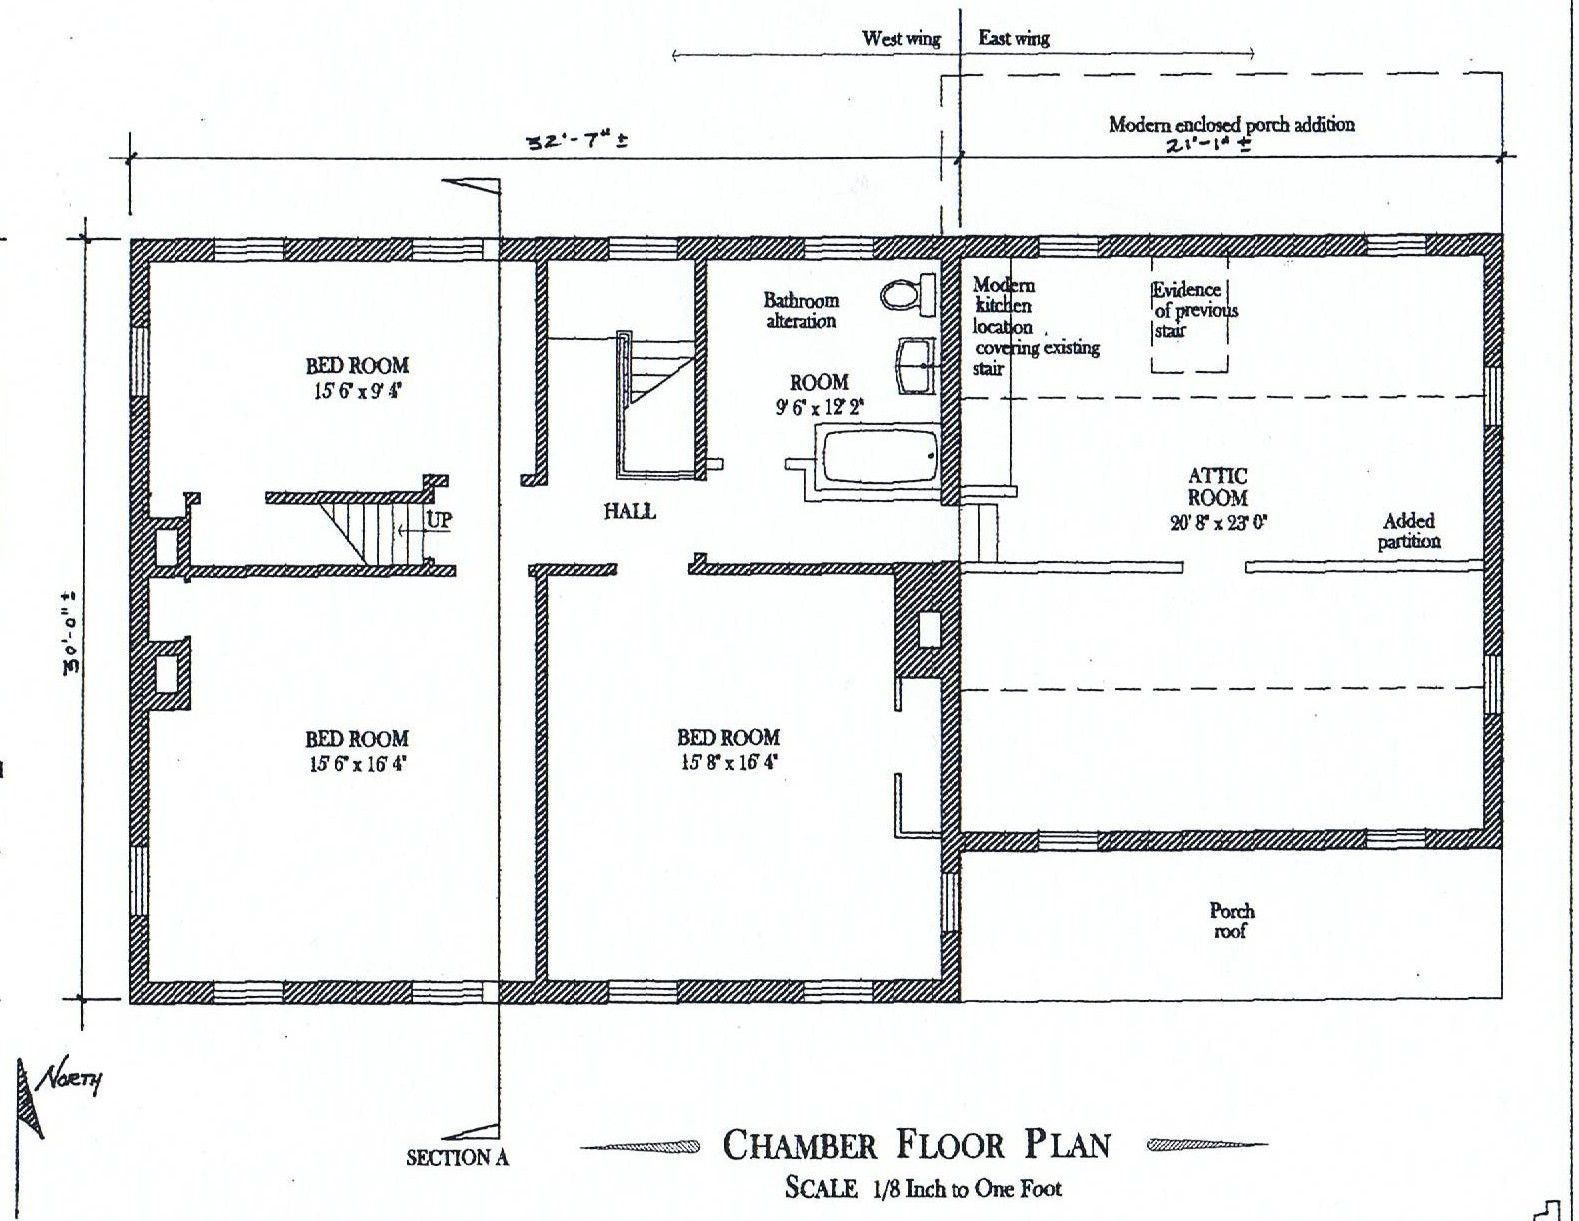 chamber floor plan